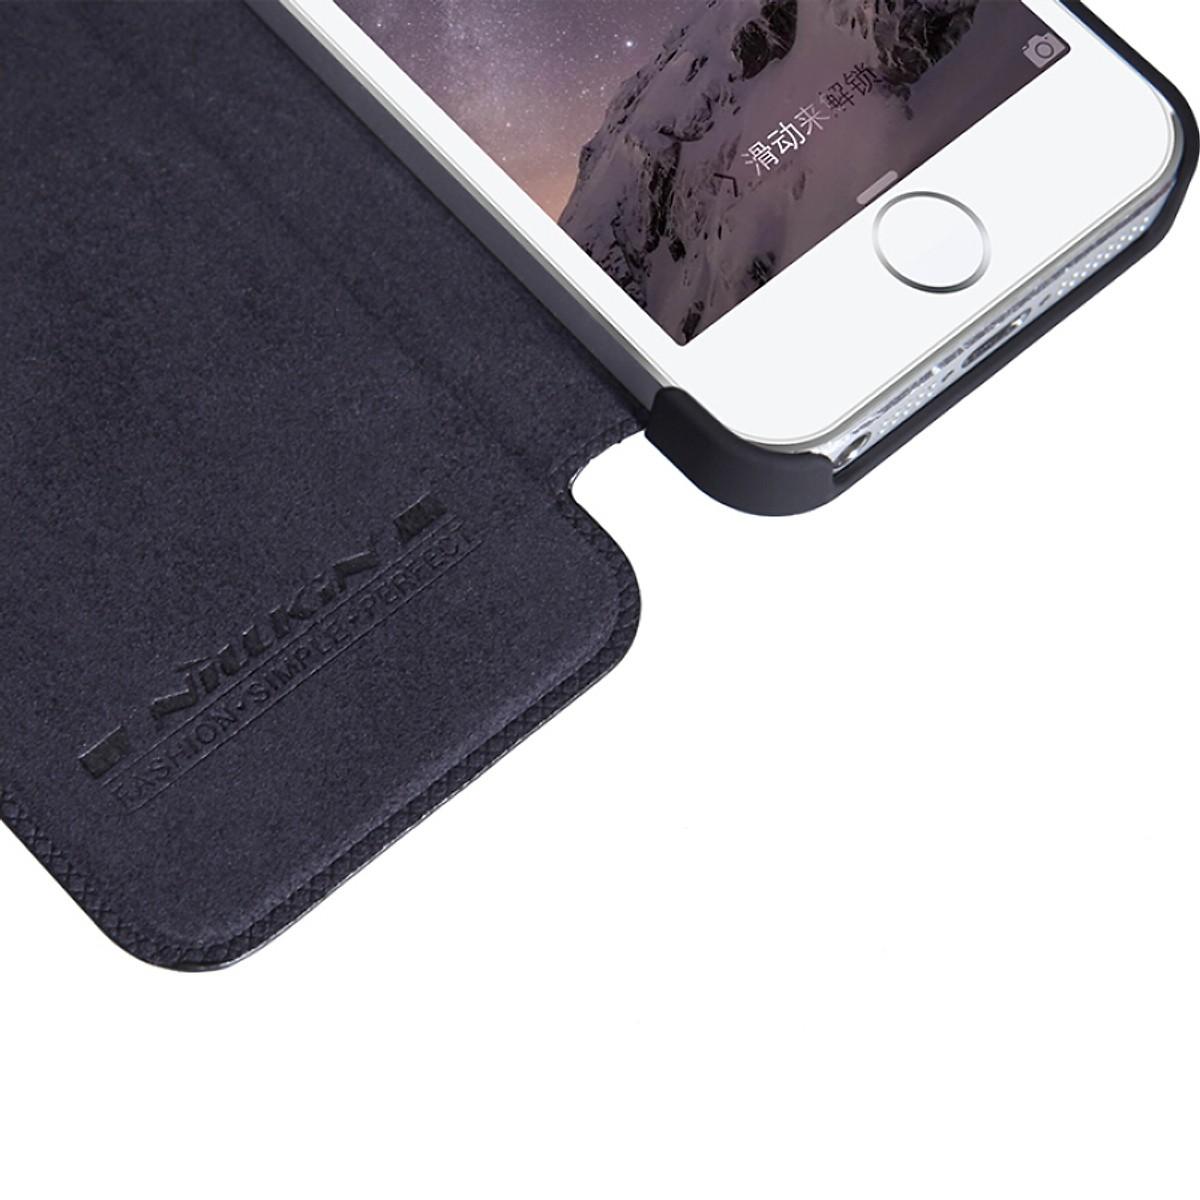 Bao Da Bảo Vệ Điện Thoại iPhone NILLKIN Nielkin